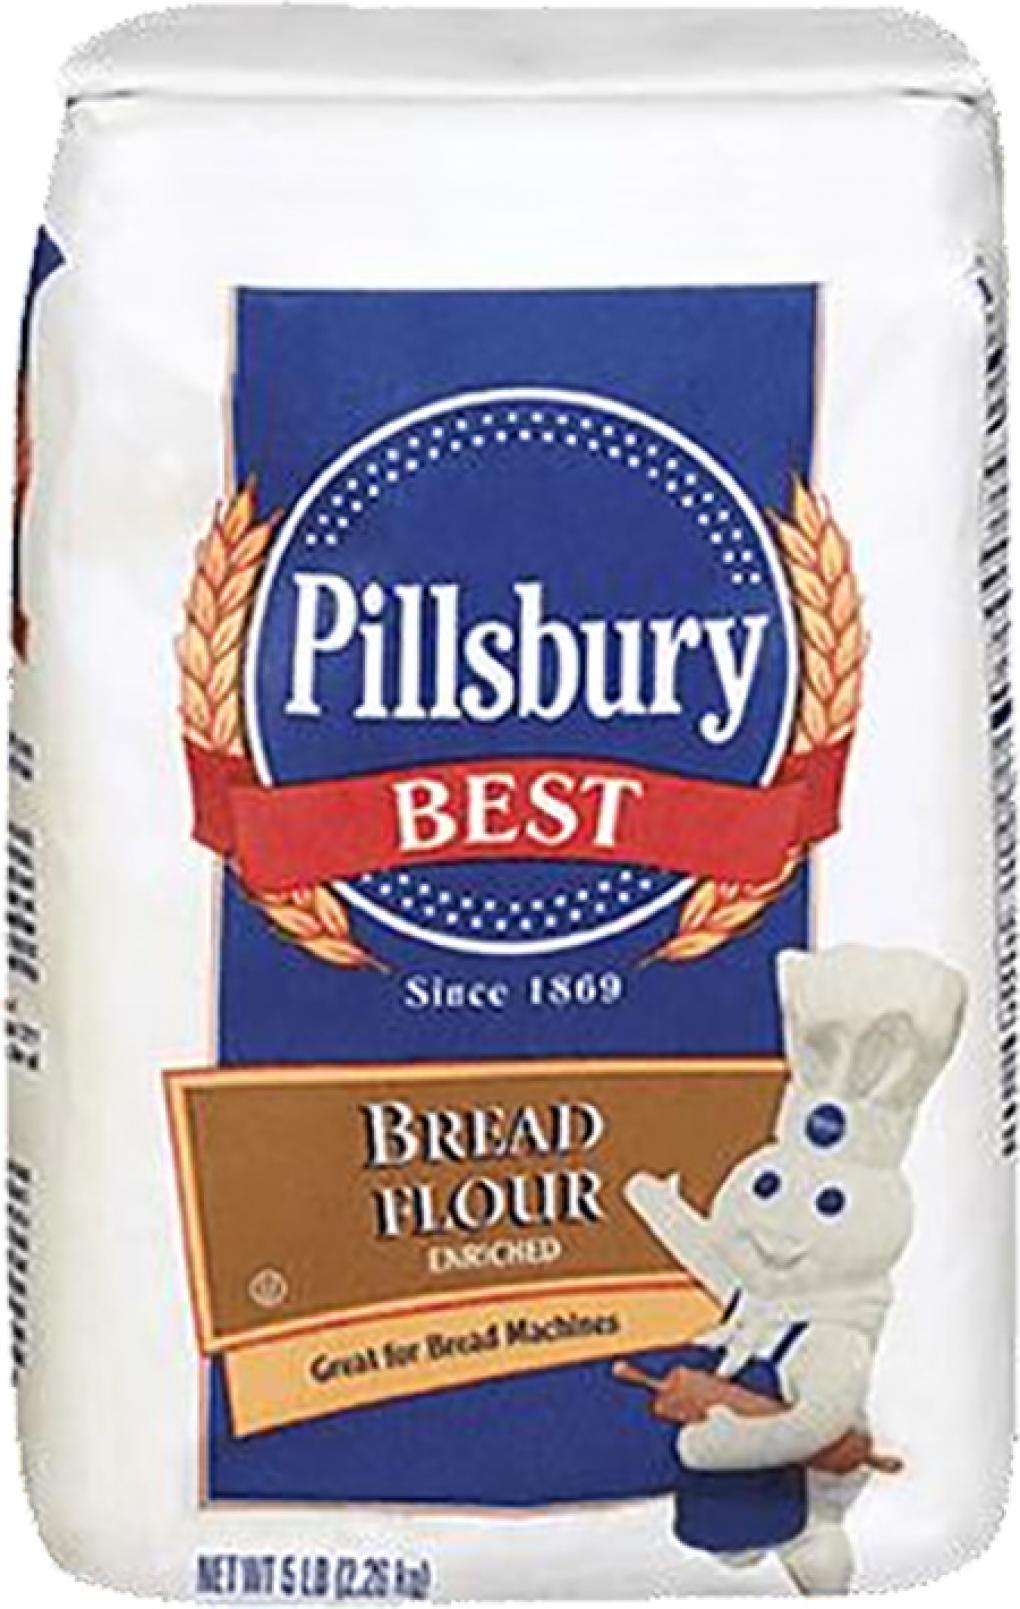 bread flour_1560753560299.jpg.jpg